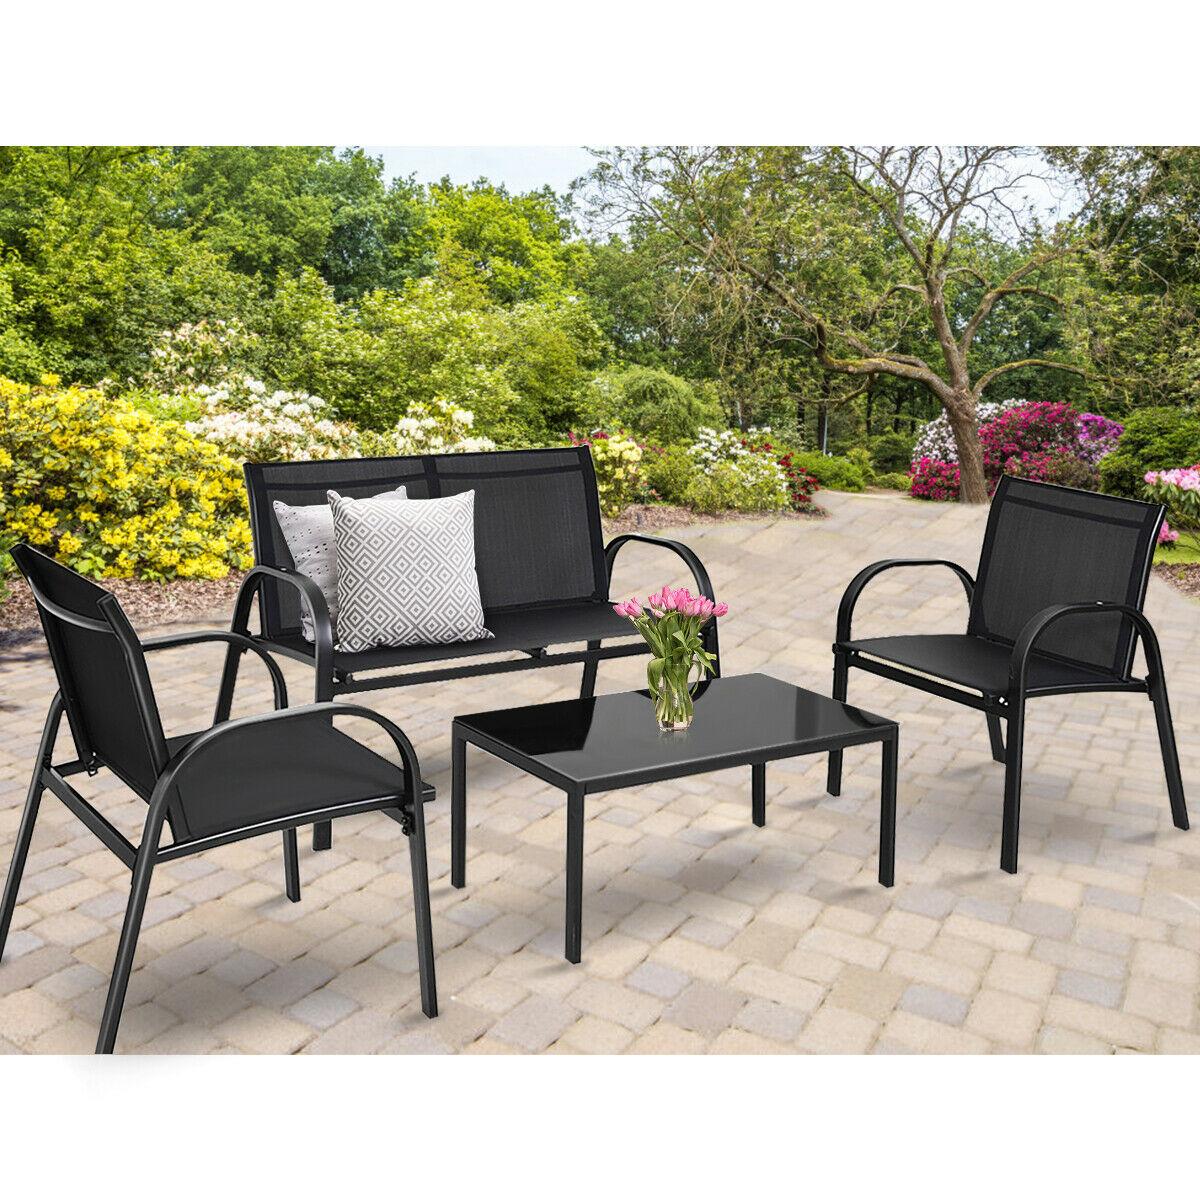 Costway 4 Pcs Patio Furniture Set Sofa Coffee Table Steel Frame Garden Deck Black Walmart pertaining to measurements 1200 X 1200